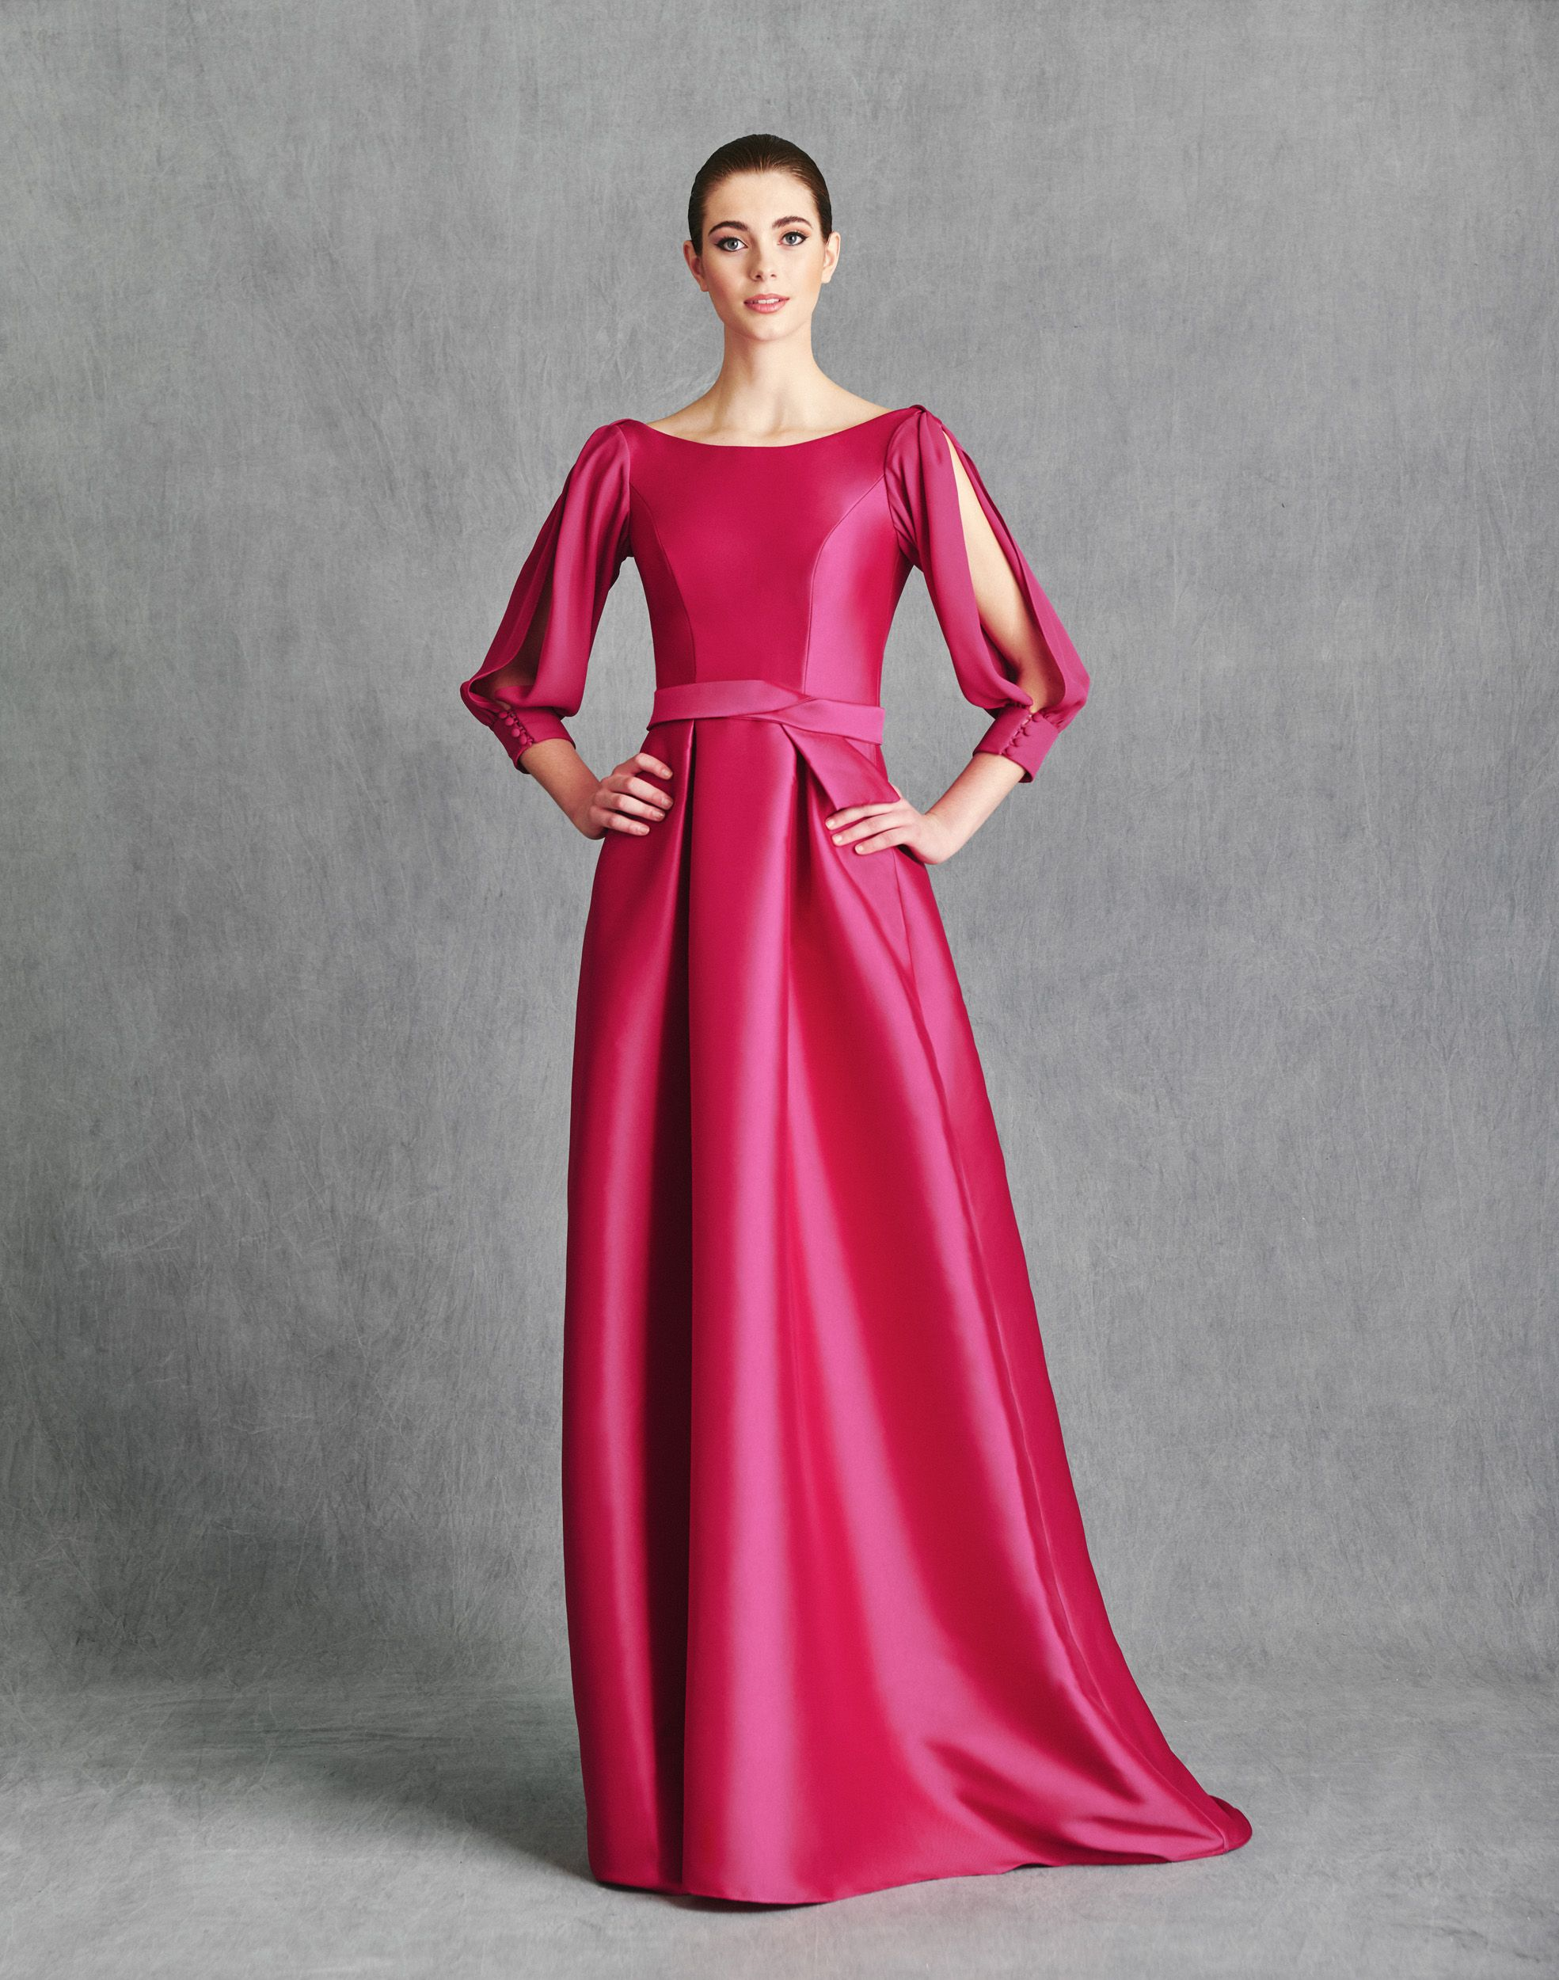 Vestidos de Fiesta 2020 - Silvia Fernandez Atelier - ILUSTRE